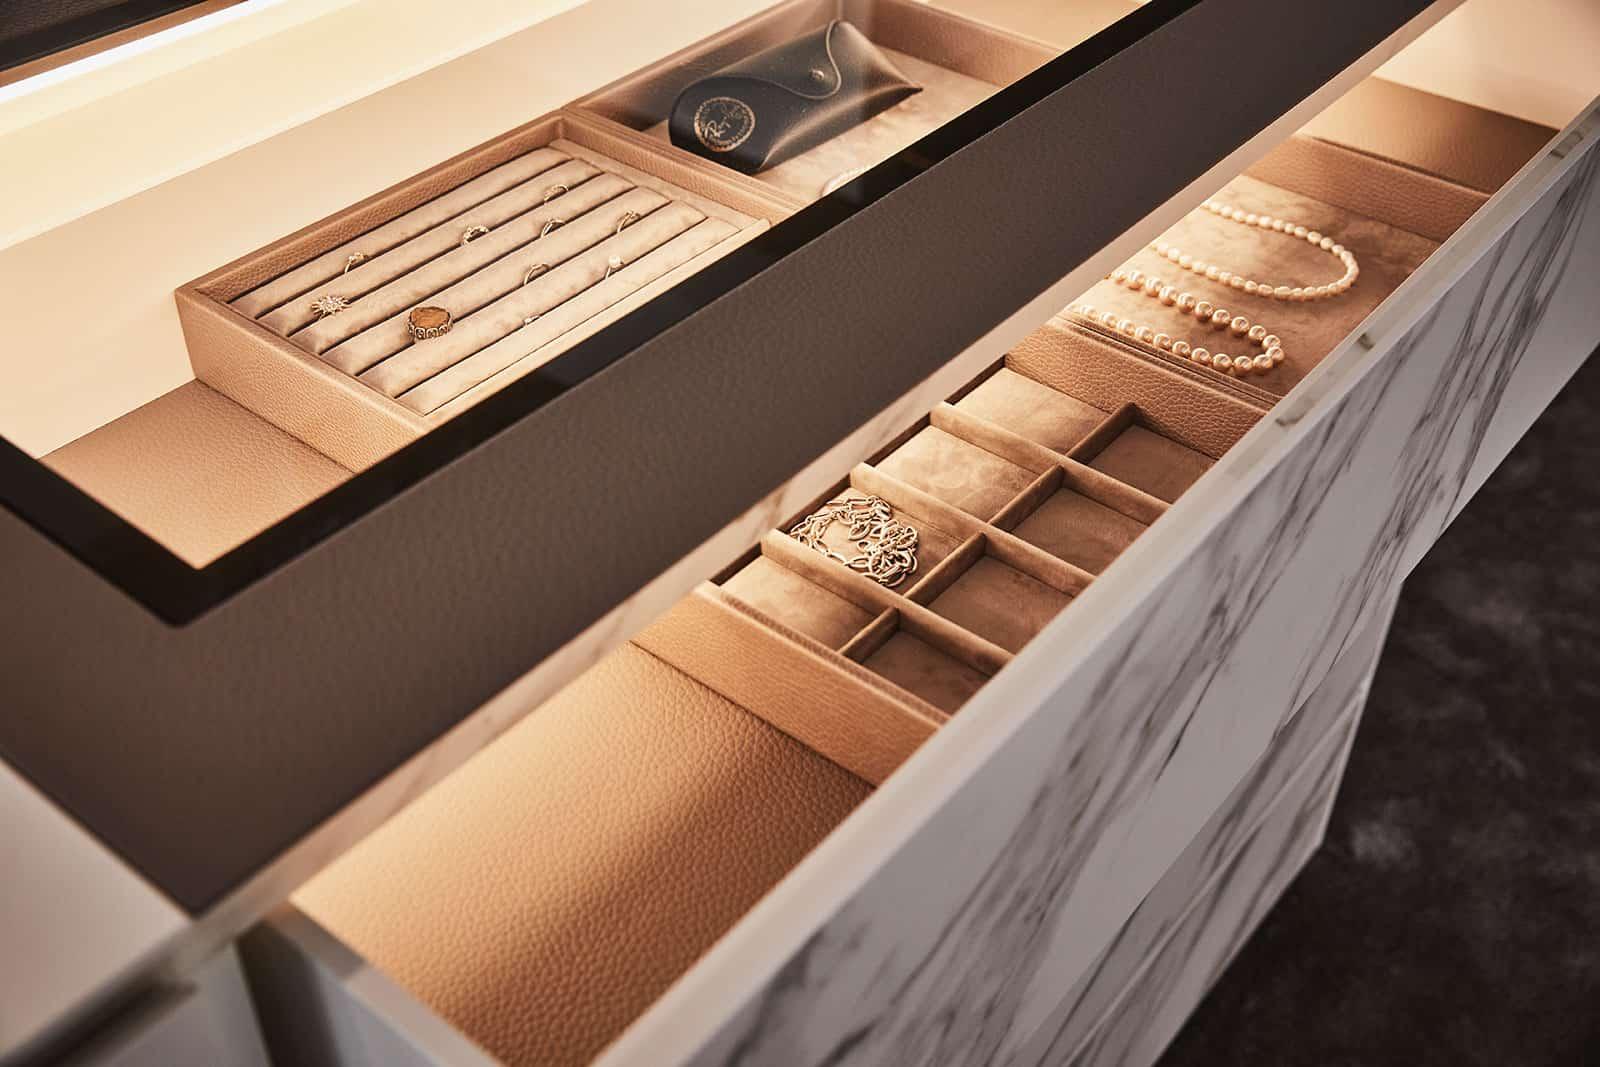 luxury jewelry displays and organizers inside schmalenbach closet system